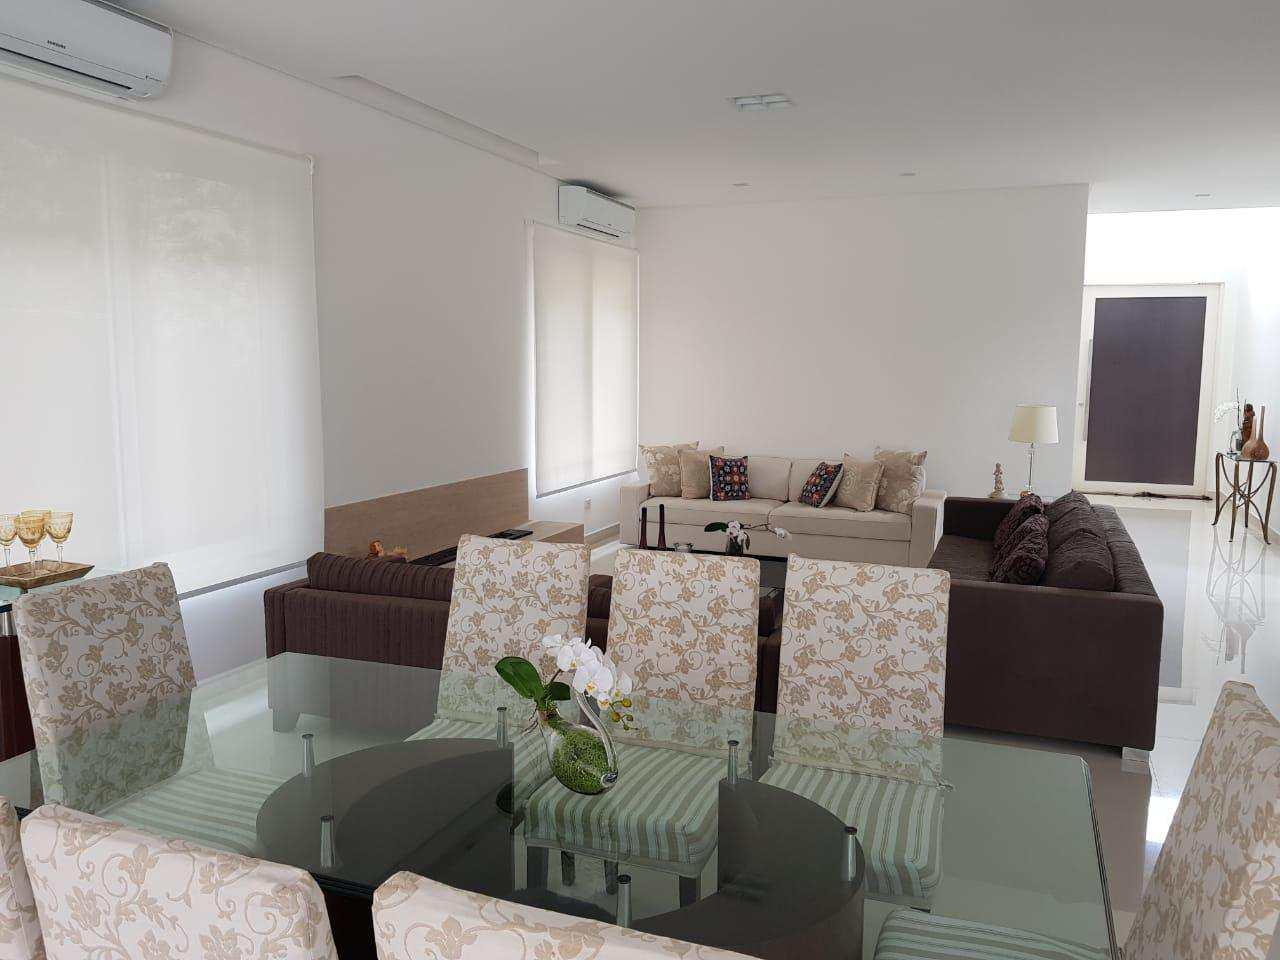 Casa de Condomínio com 4 suítes, lazer integrado